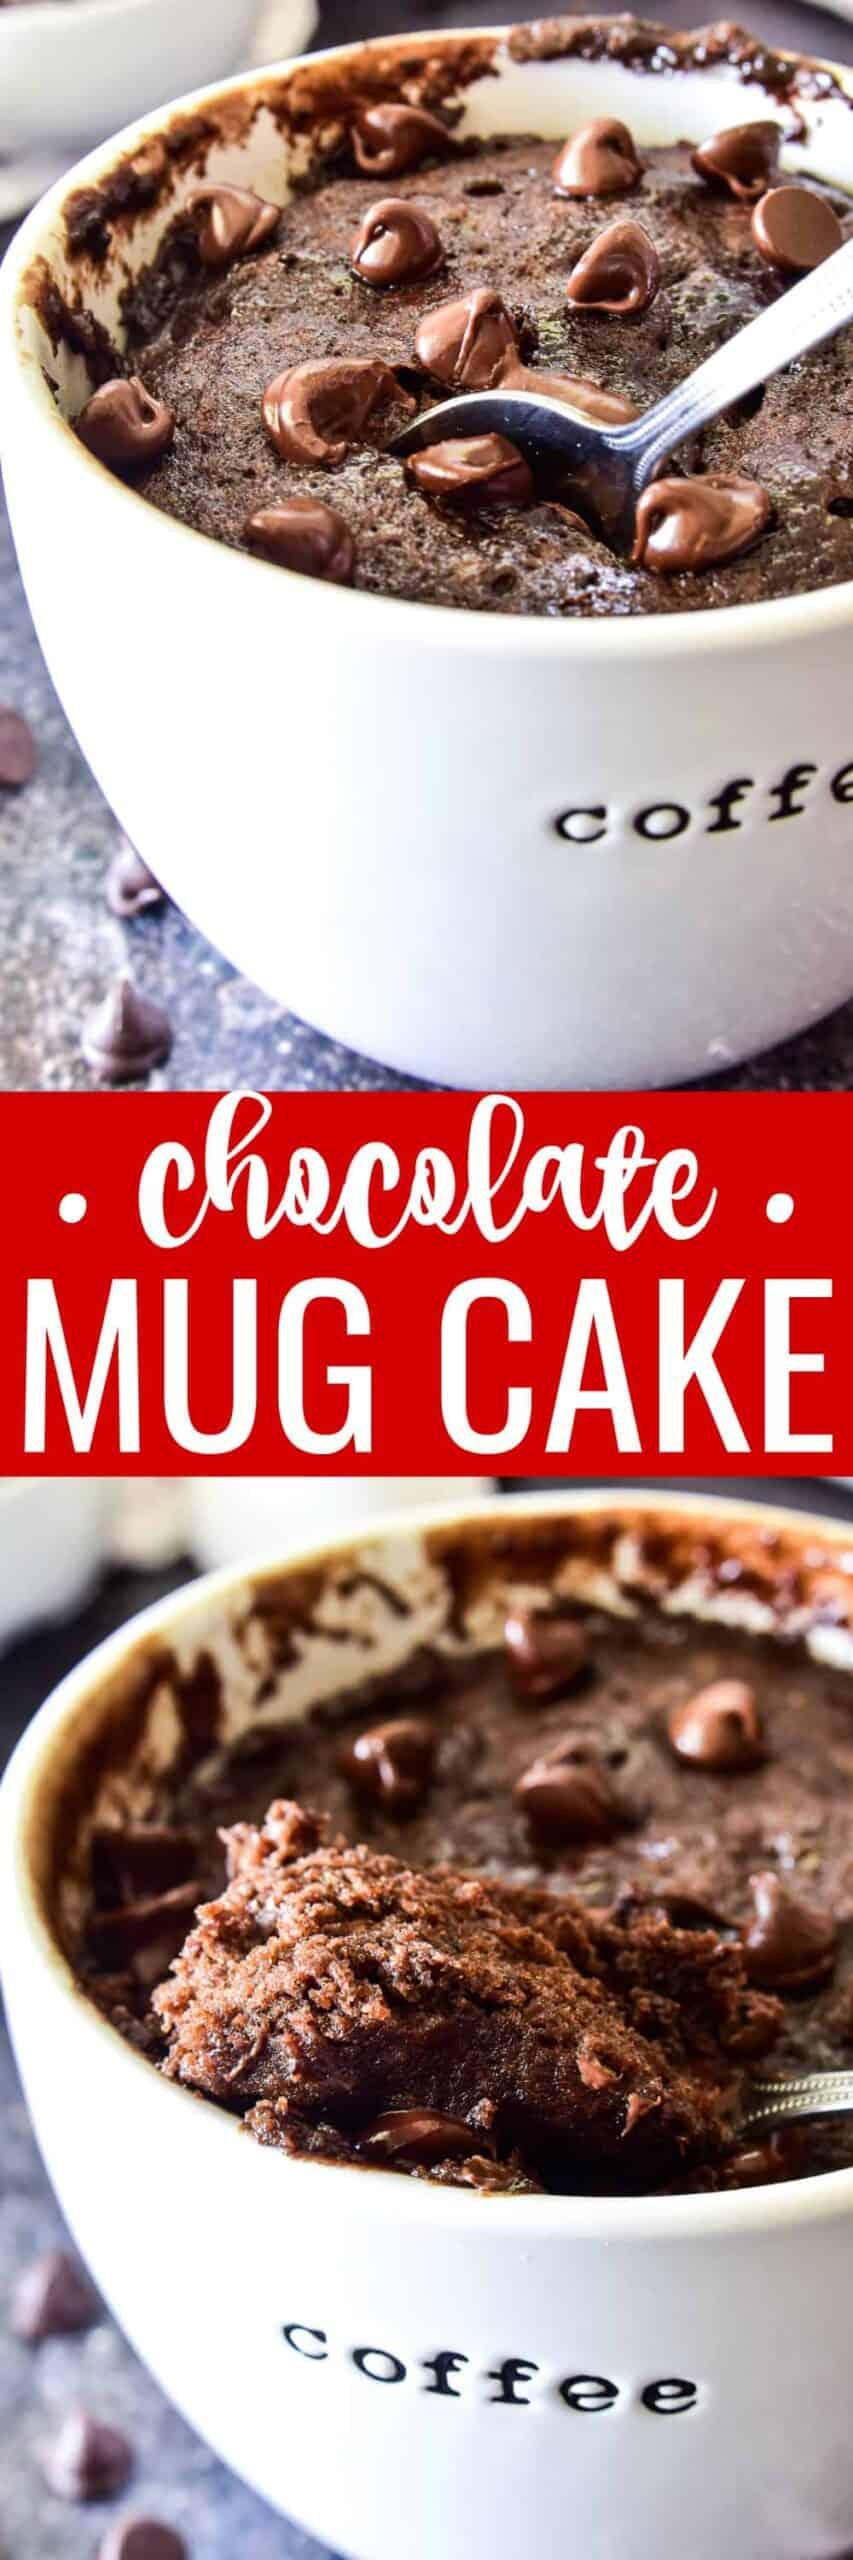 Chocolate Mug Cake Lemon Tree Dwelling